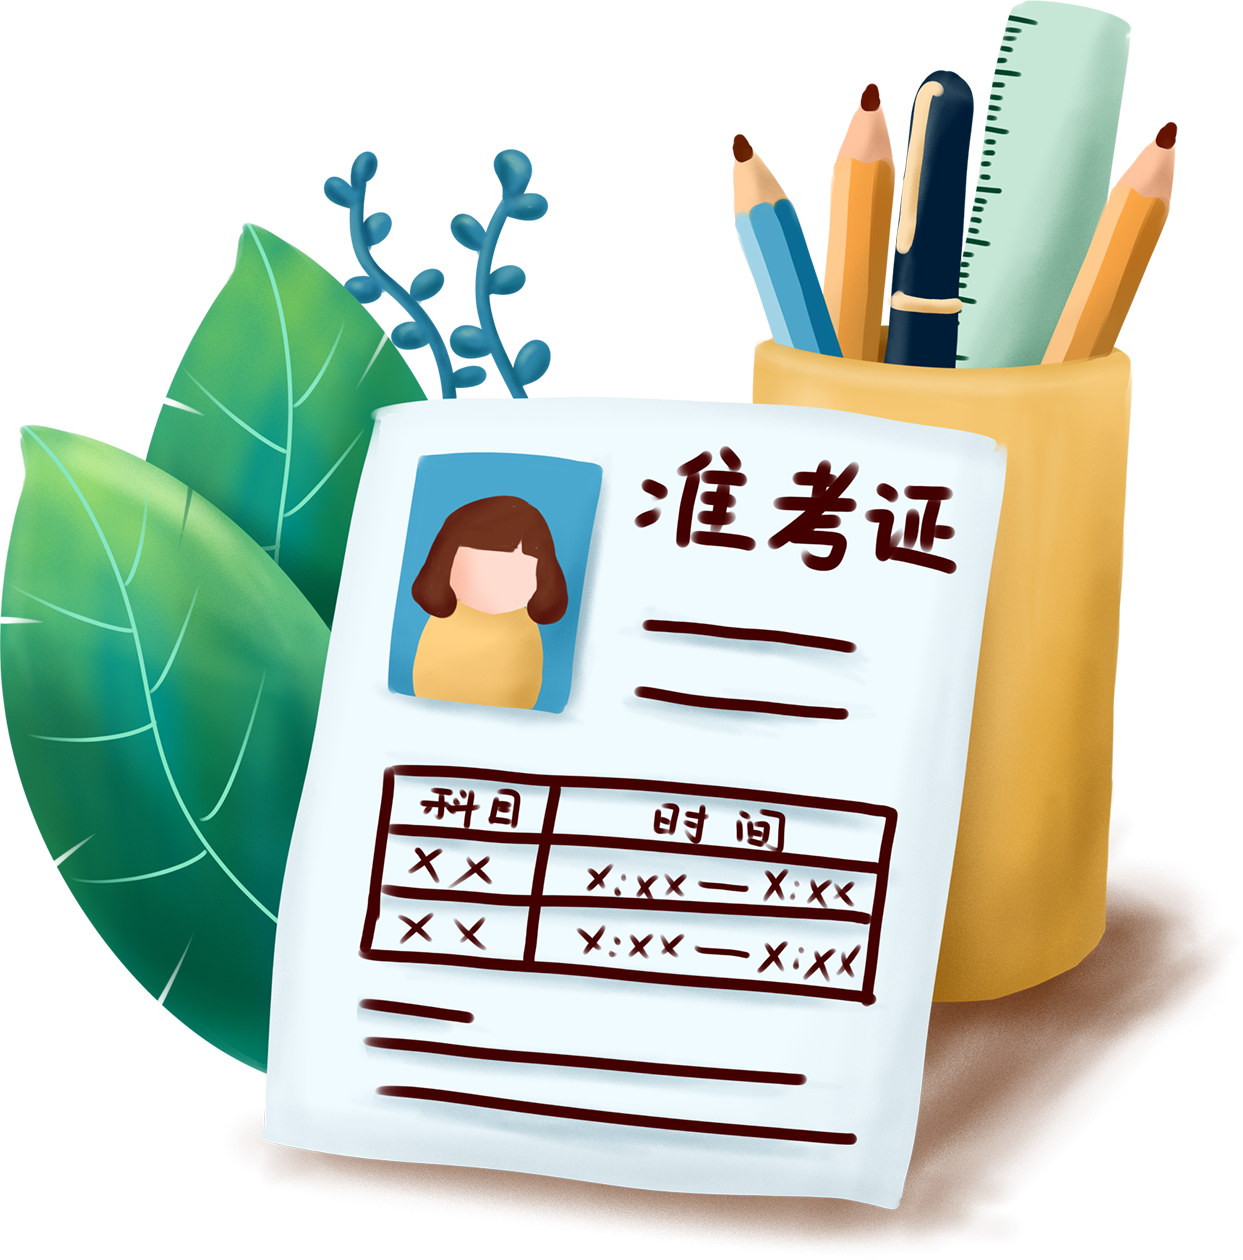 考试_0004_5.png